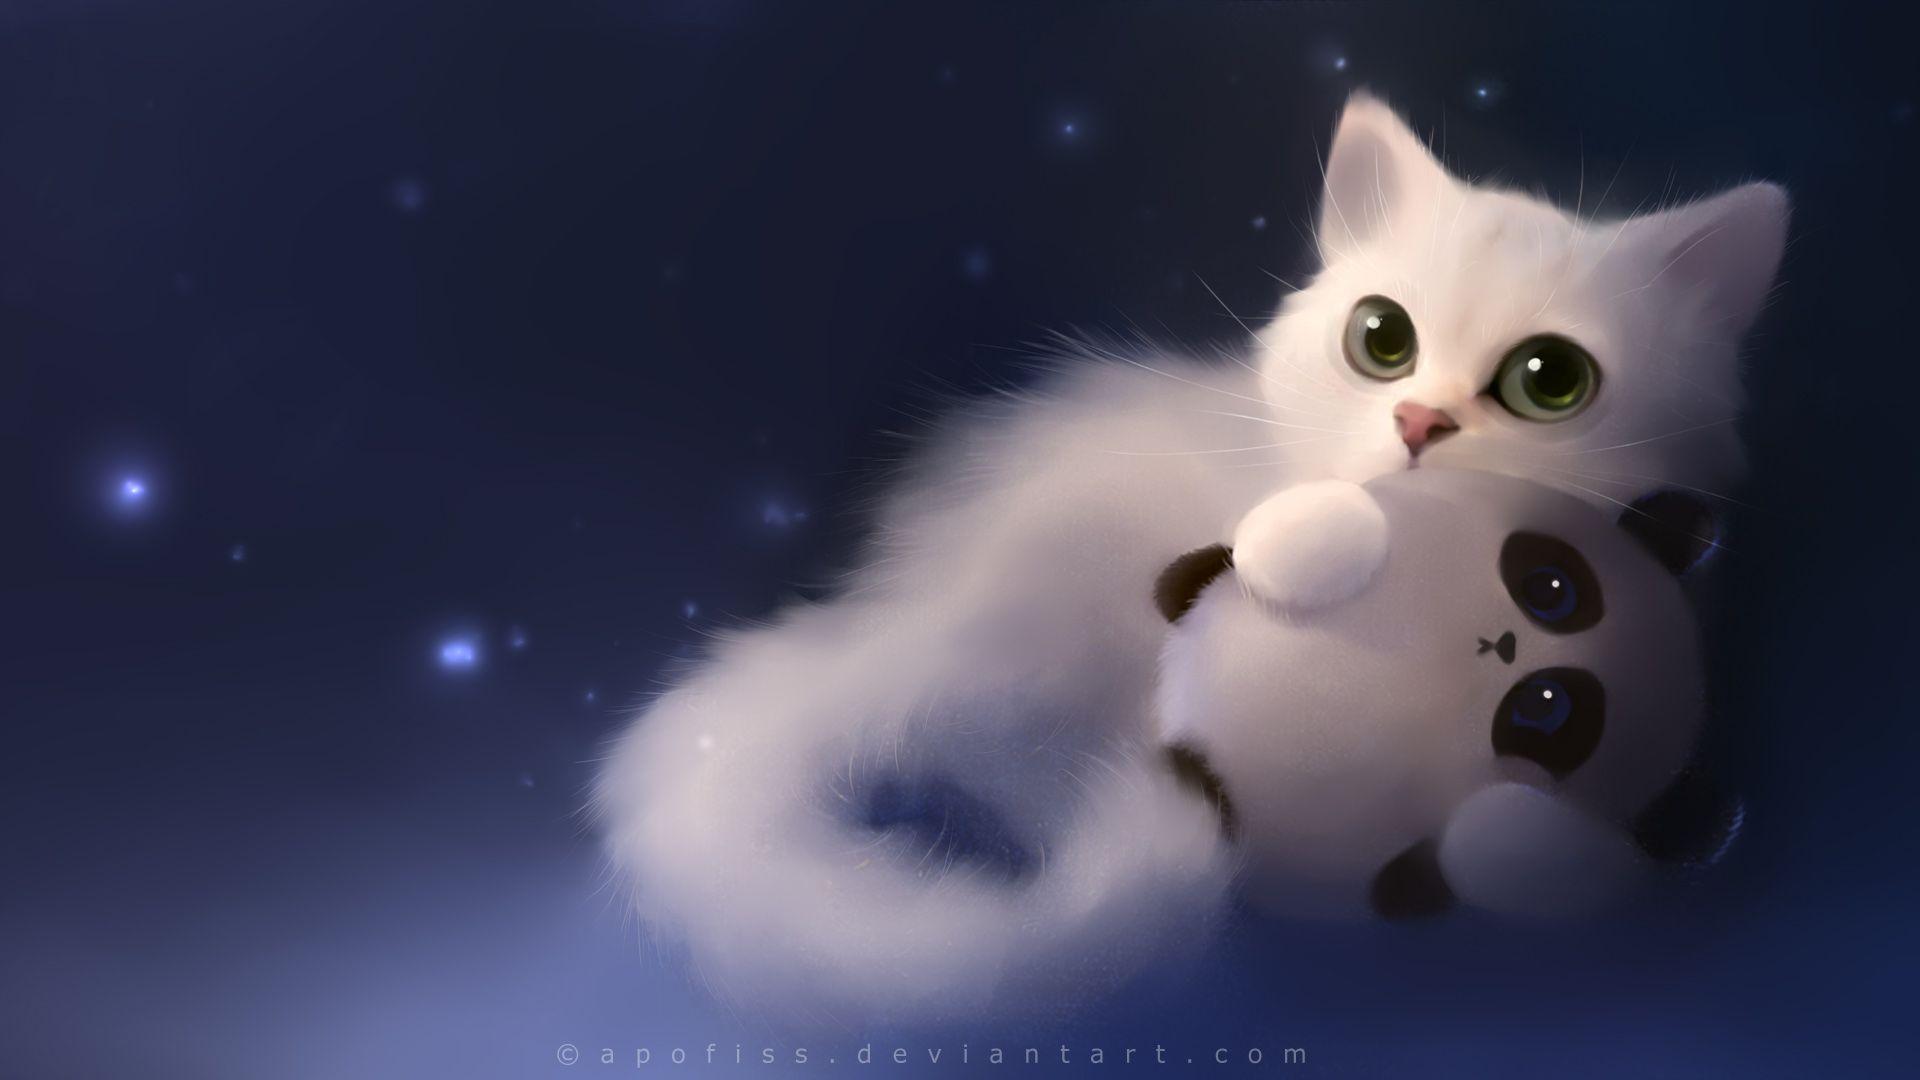 Drawn wallpaper cute anime cat Px Free Animal Bunny 1920x1080